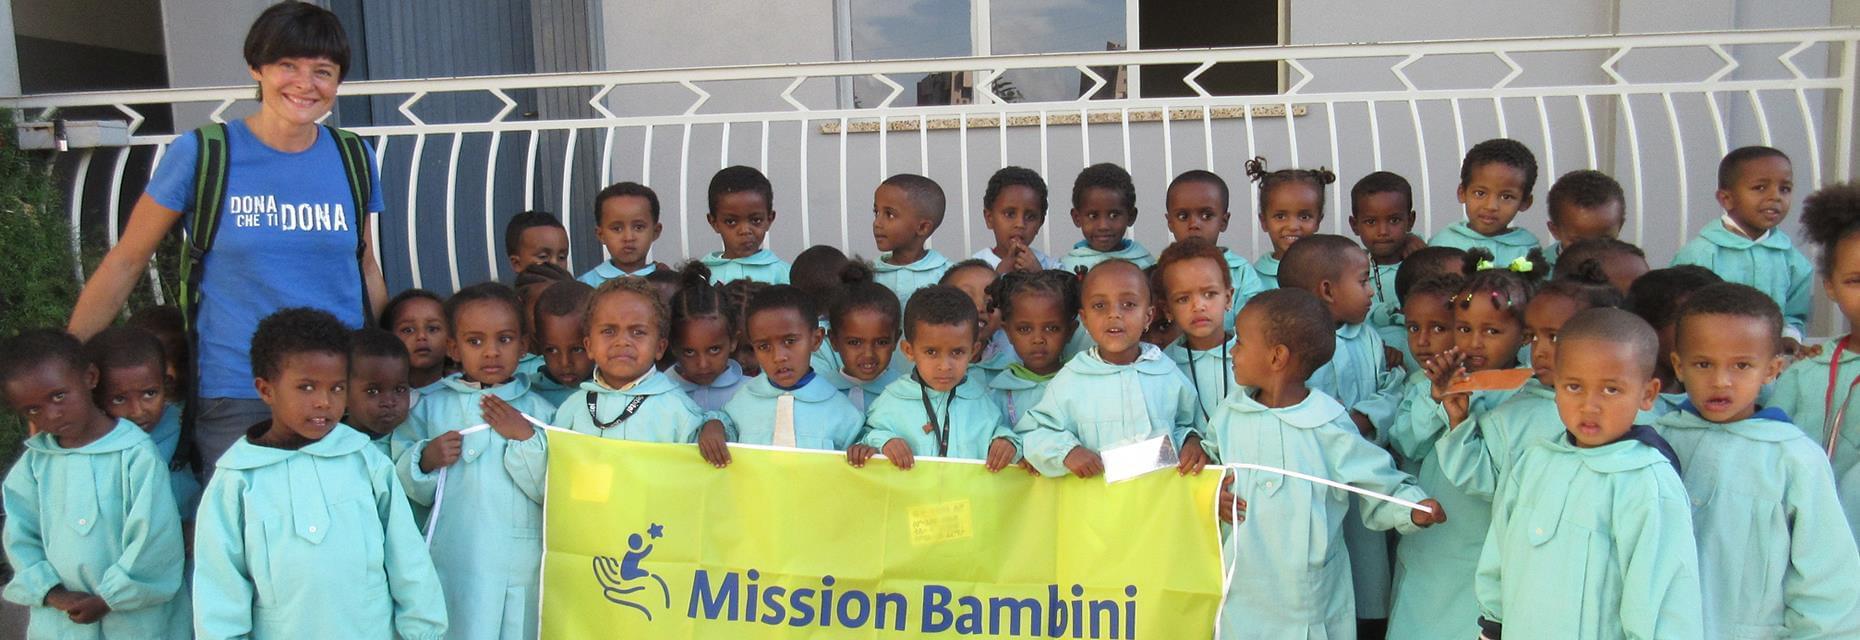 testata mission bambini